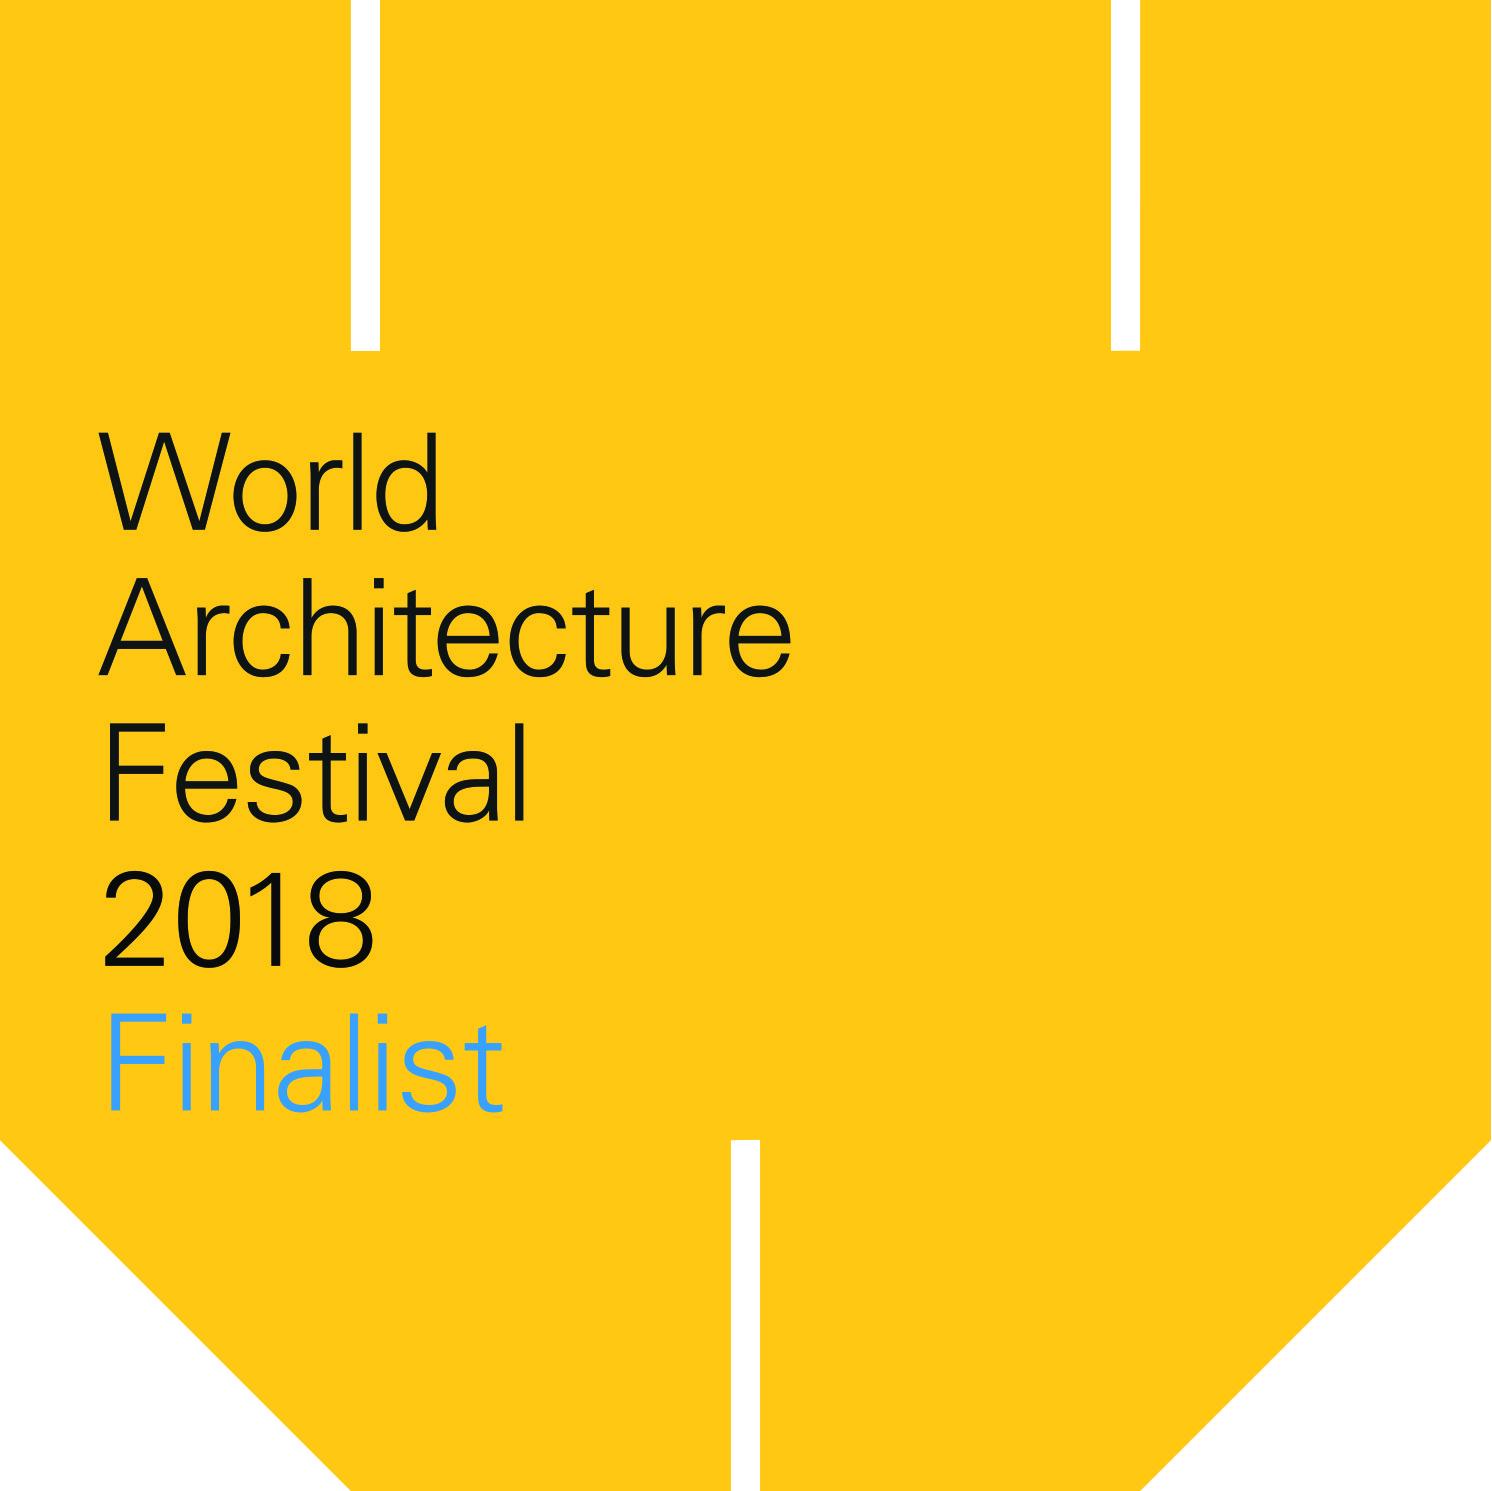 mjarc arquitectos concursos internacionais pa